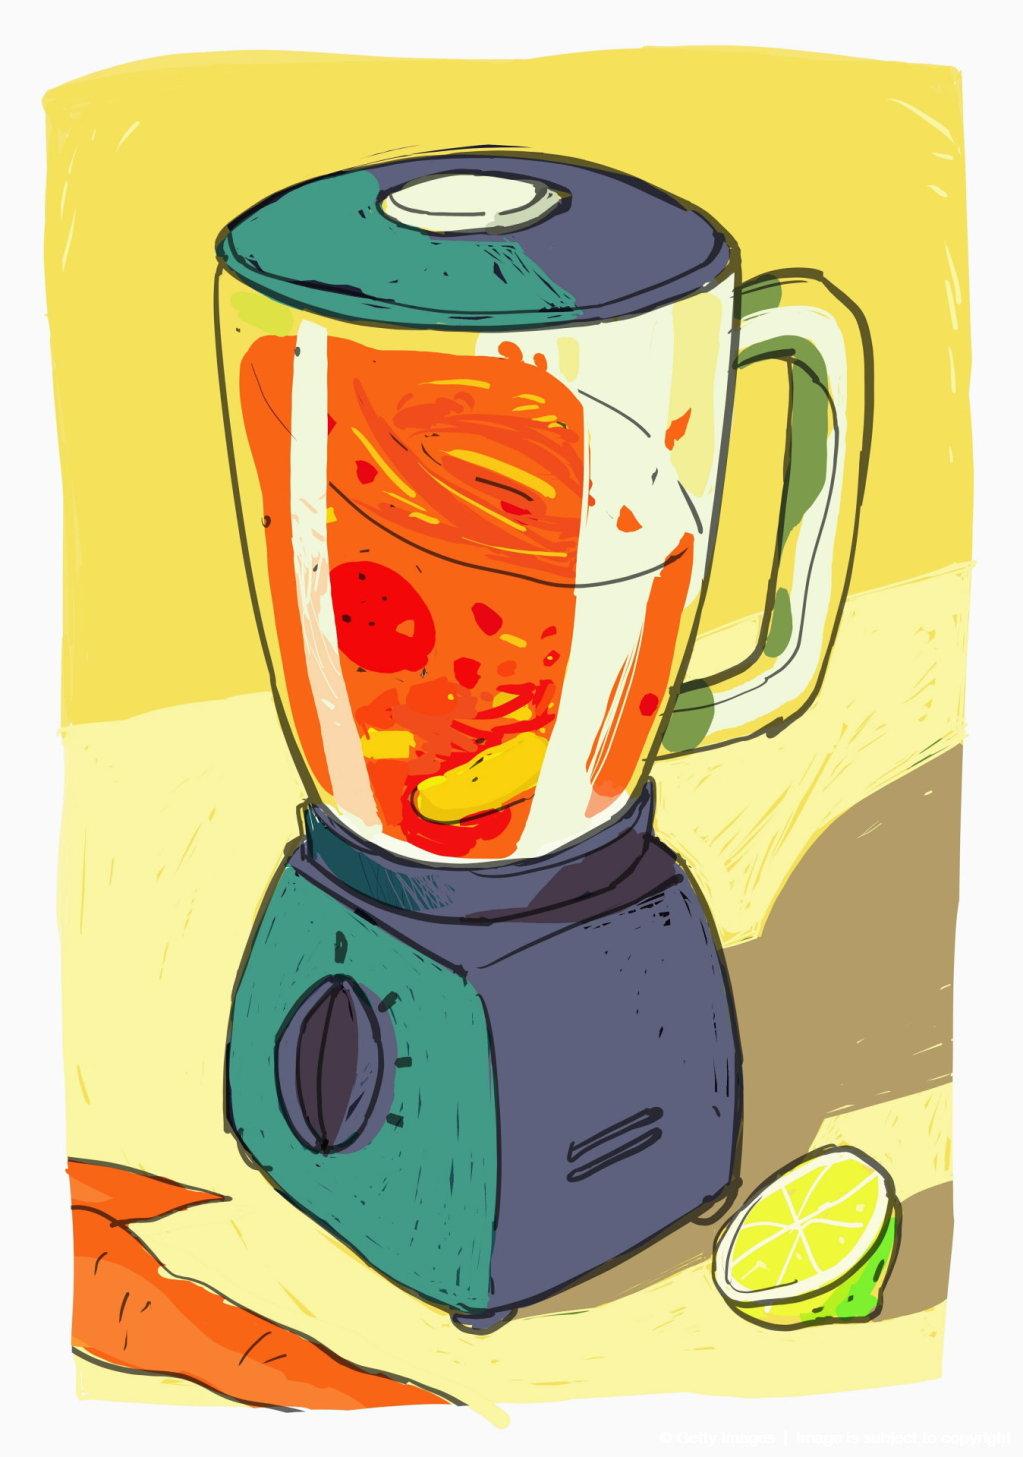 Grinder clipart mixer grinder #8